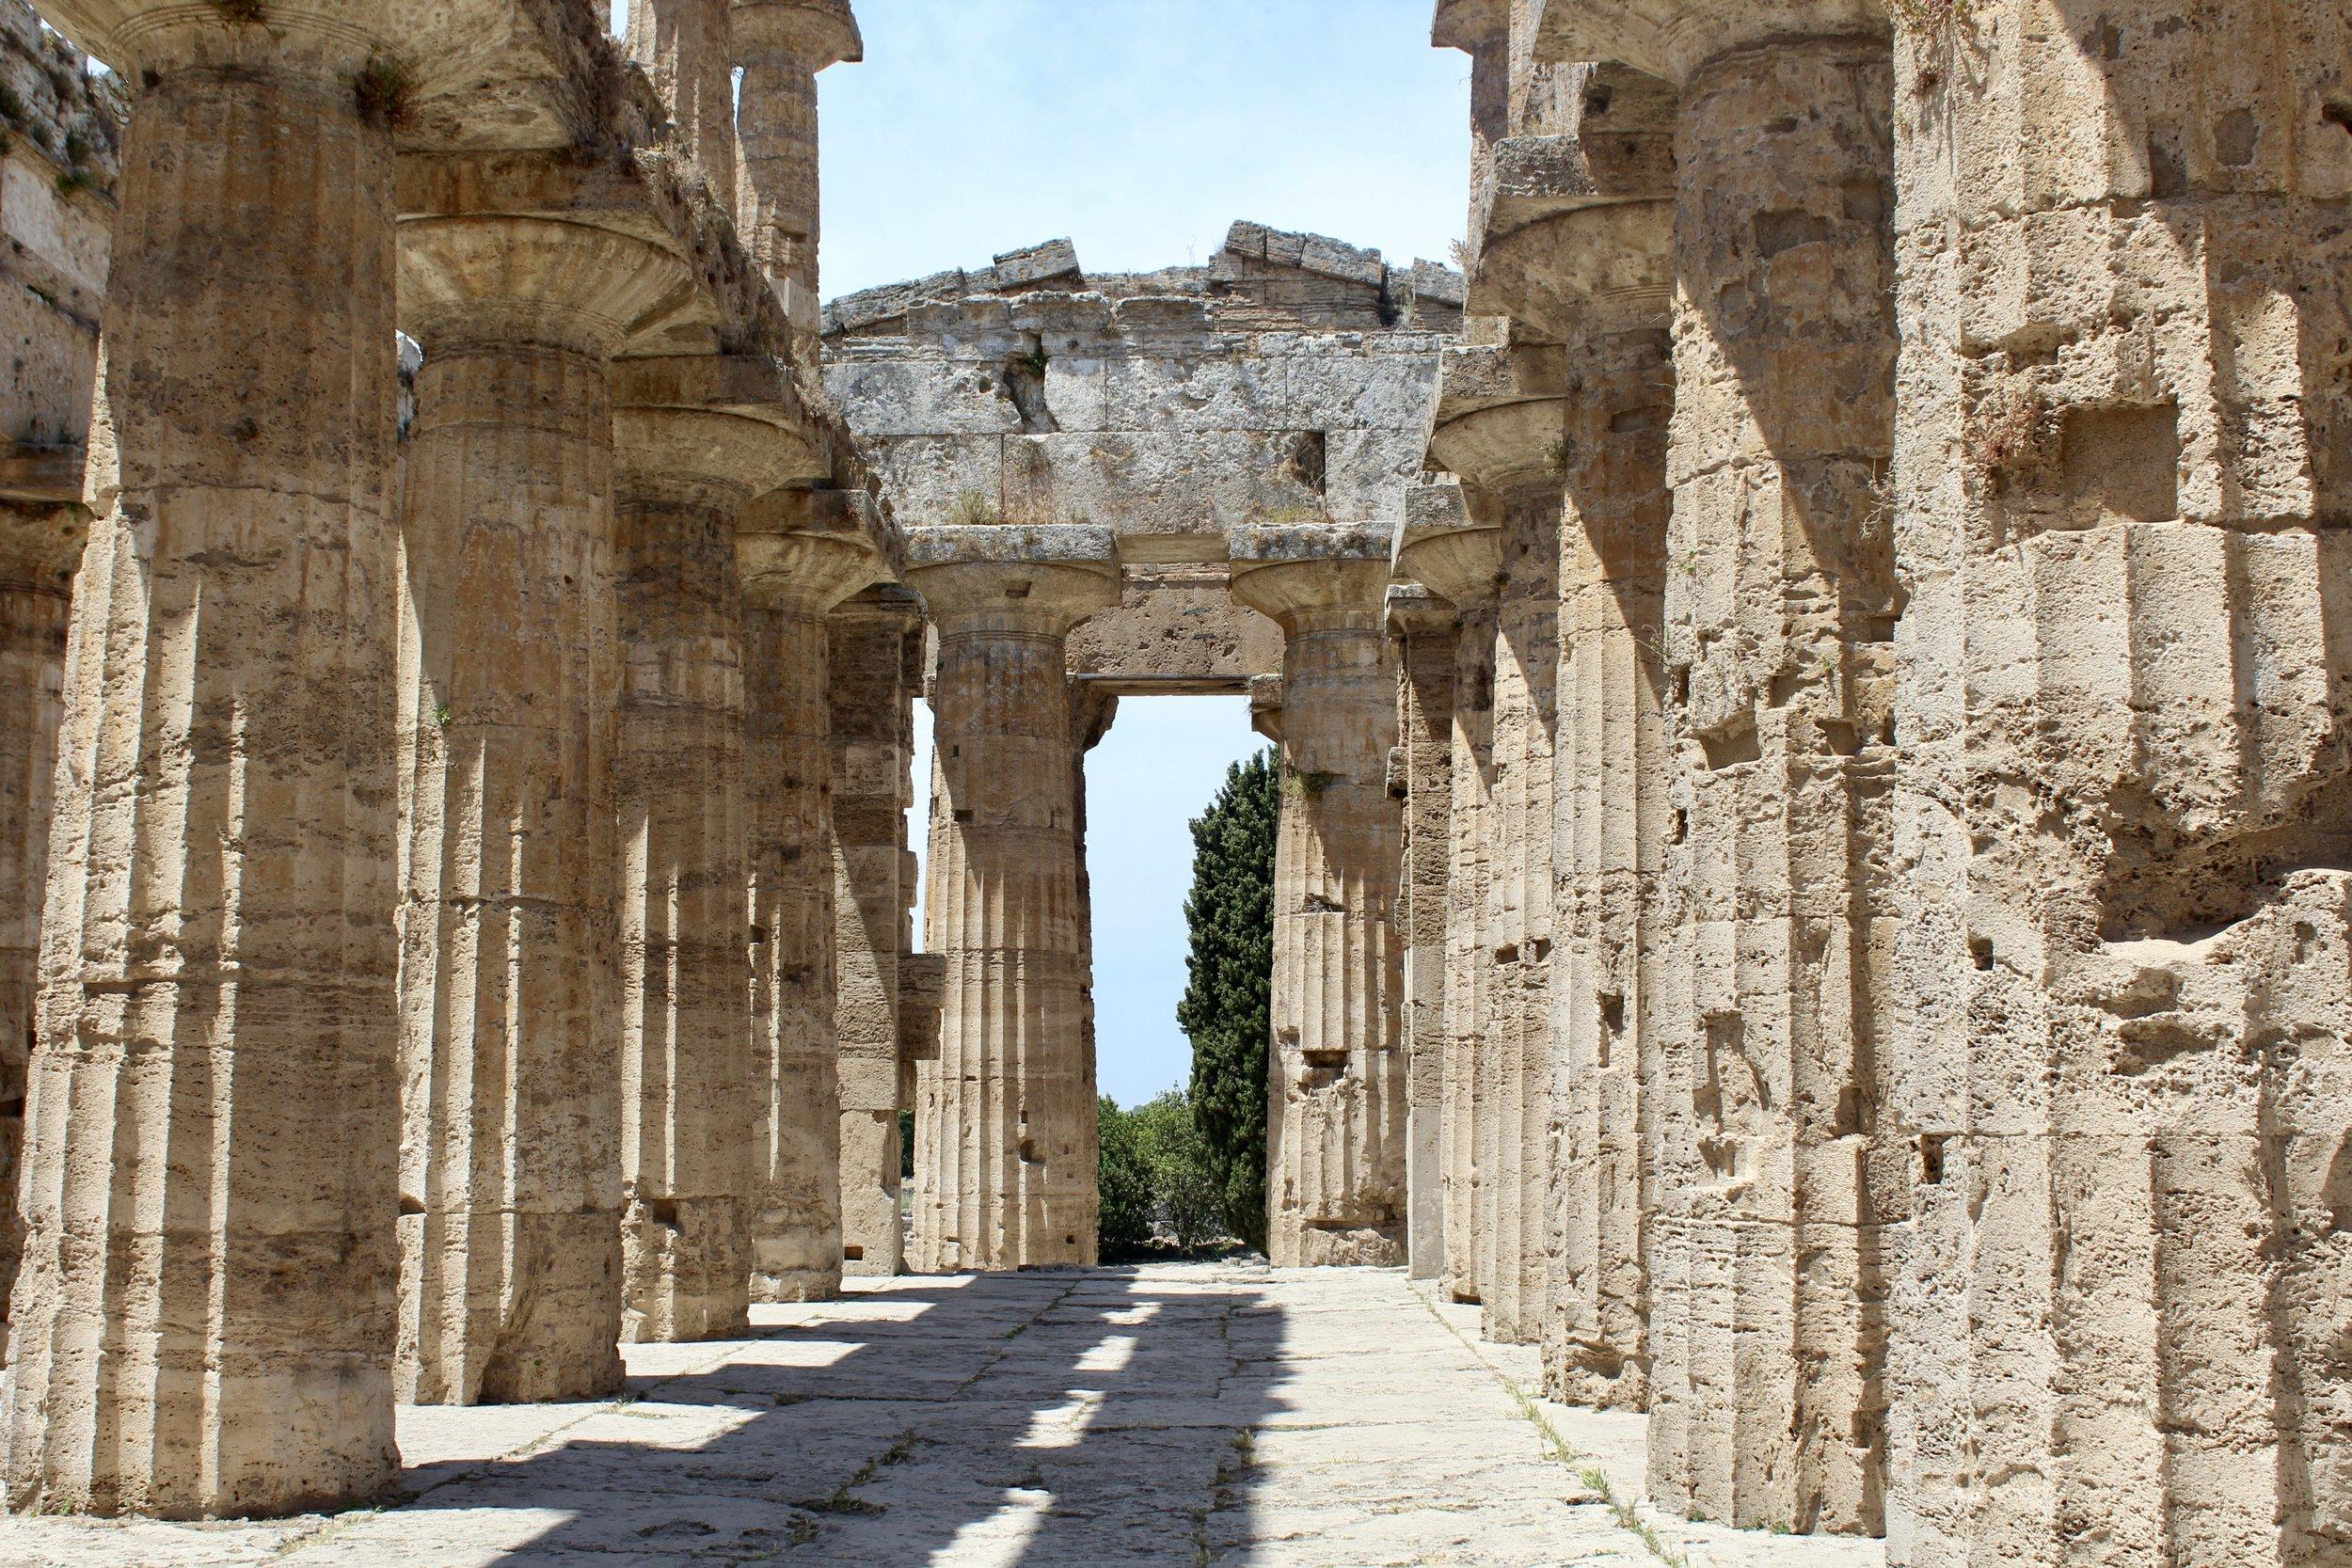 Ruins of the 6th century B.C.E. Greek temples looking toward Capaccio. Photo credit: Danielle Oteri